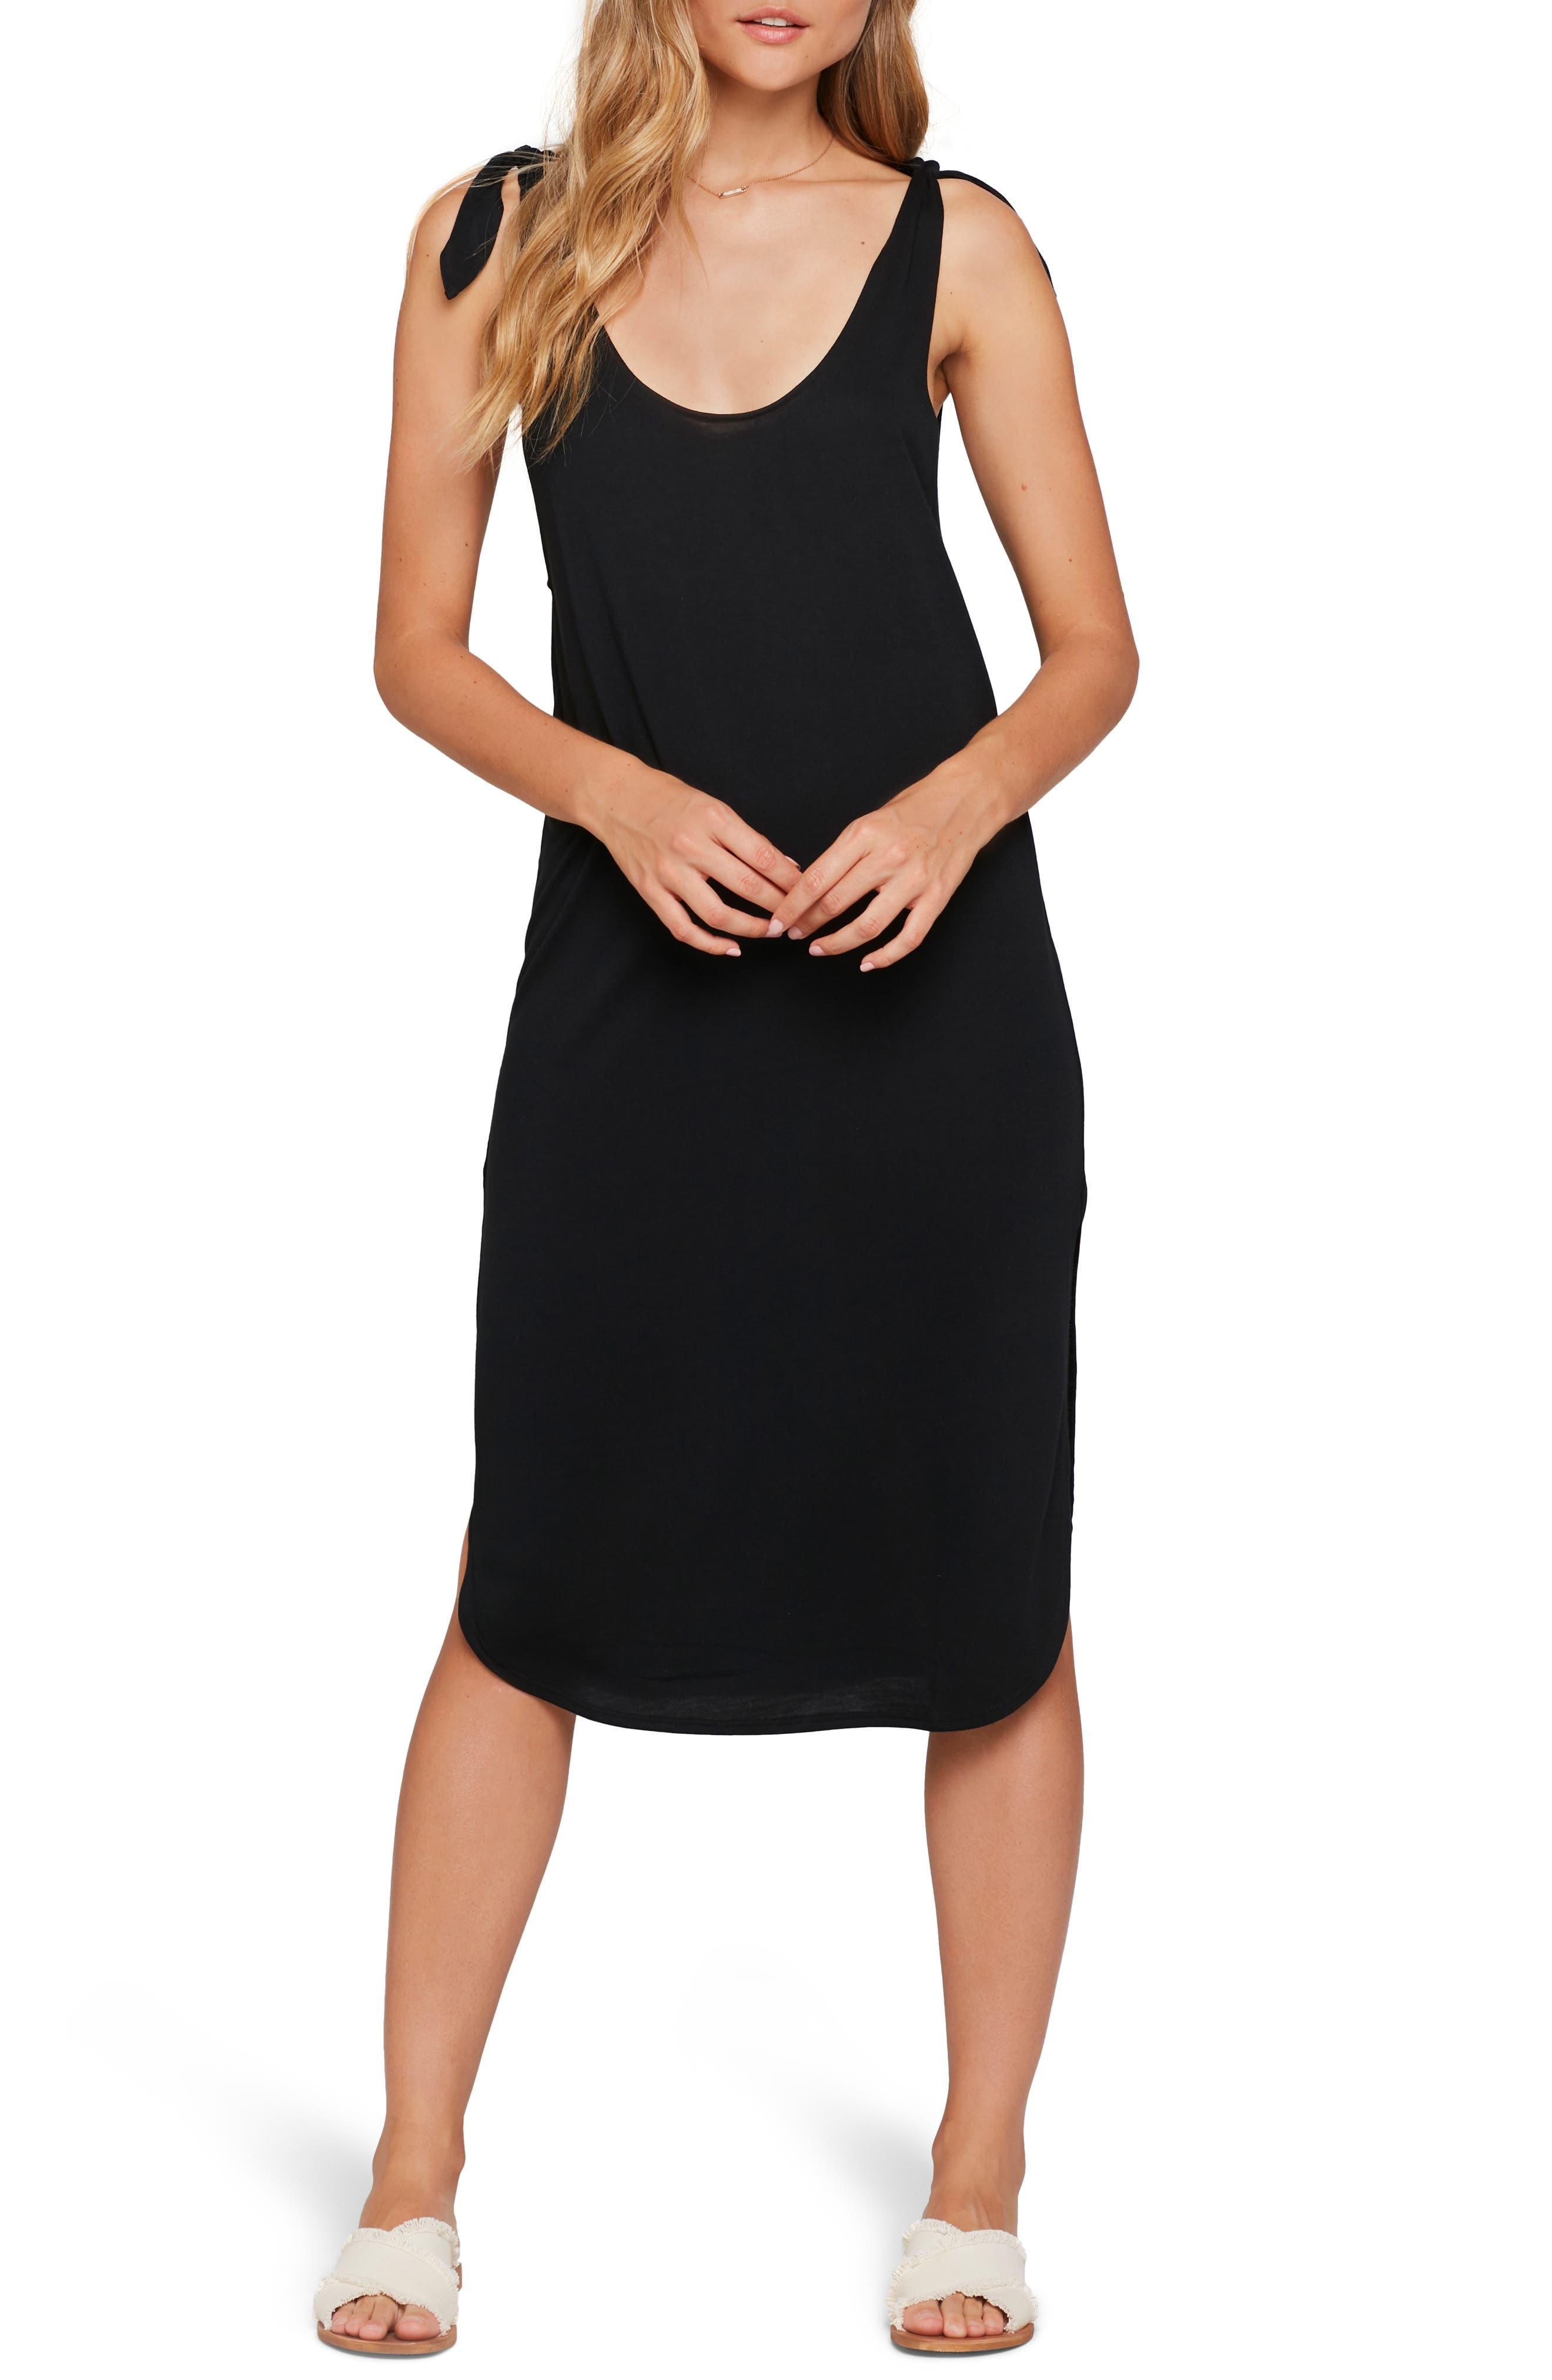 Komo Beach Cover-Up Dress,                             Main thumbnail 1, color,                             BLACK